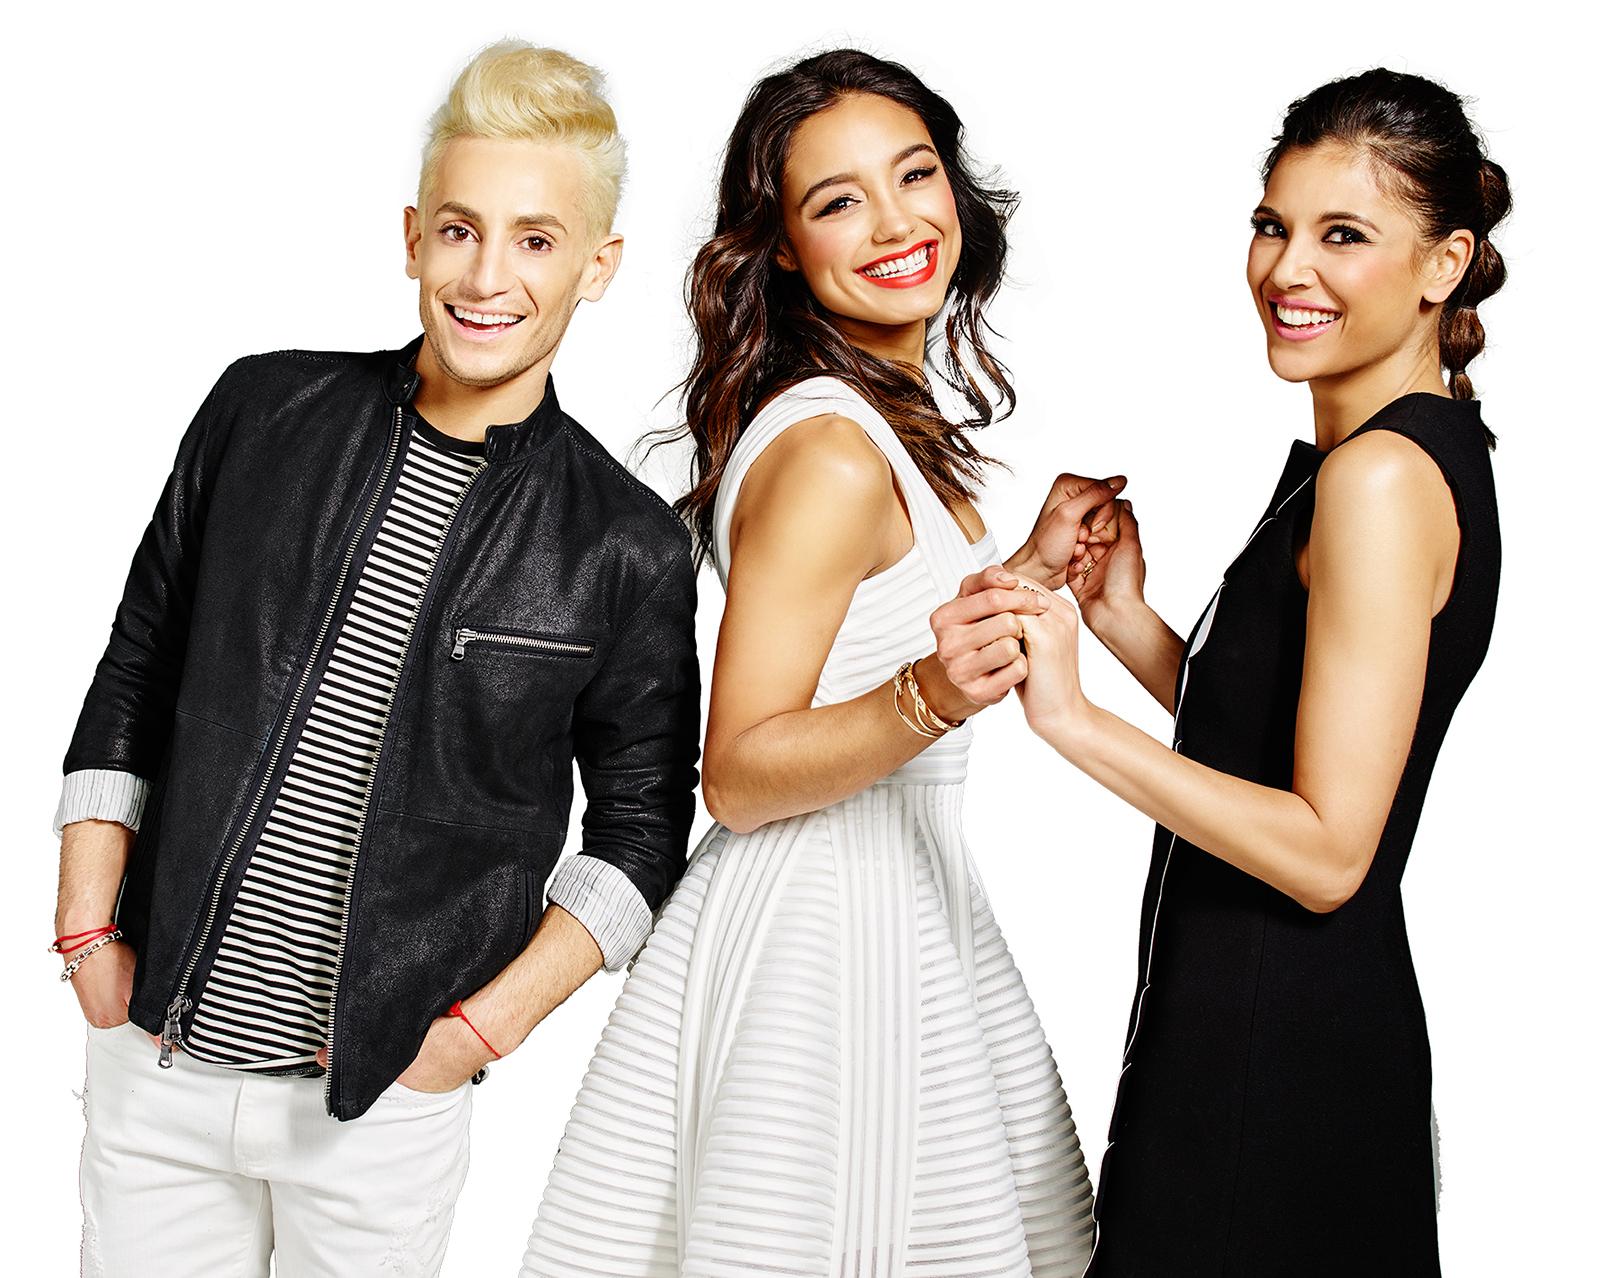 Frankie Grande, Rachel Smith and Lyndsey Rodrigues